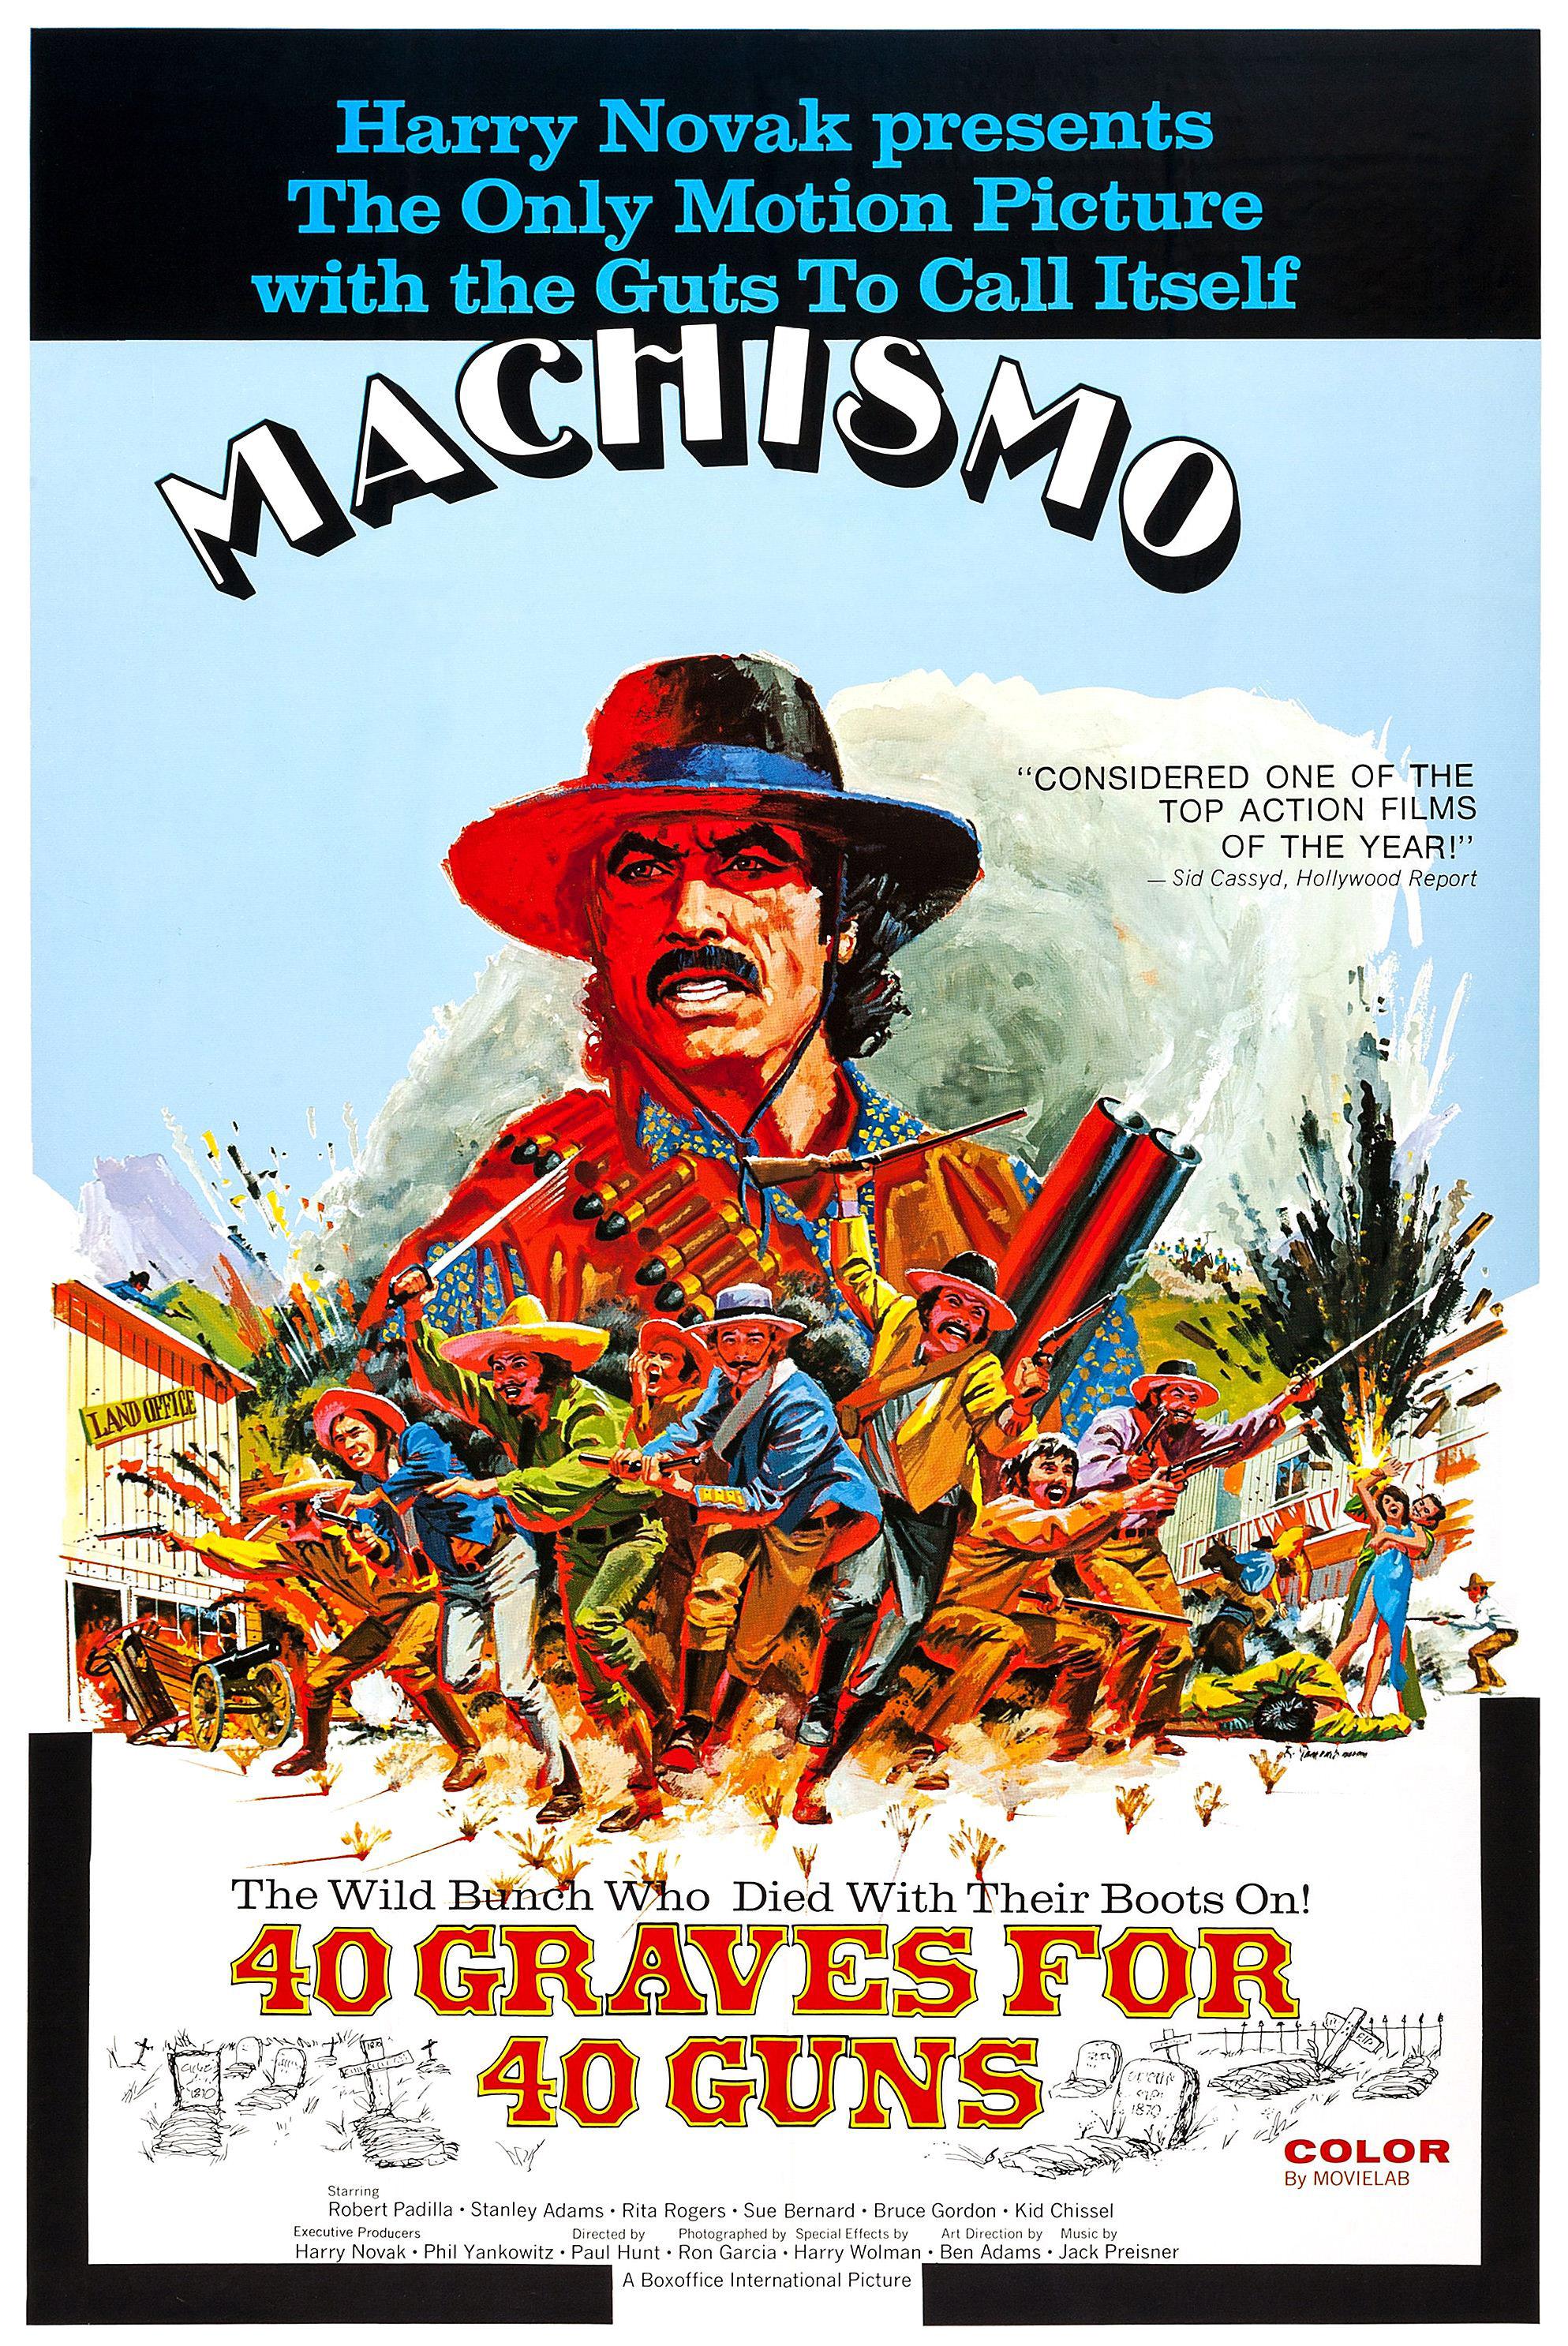 Machismo - 40 Graves for 40 Guns (1971)